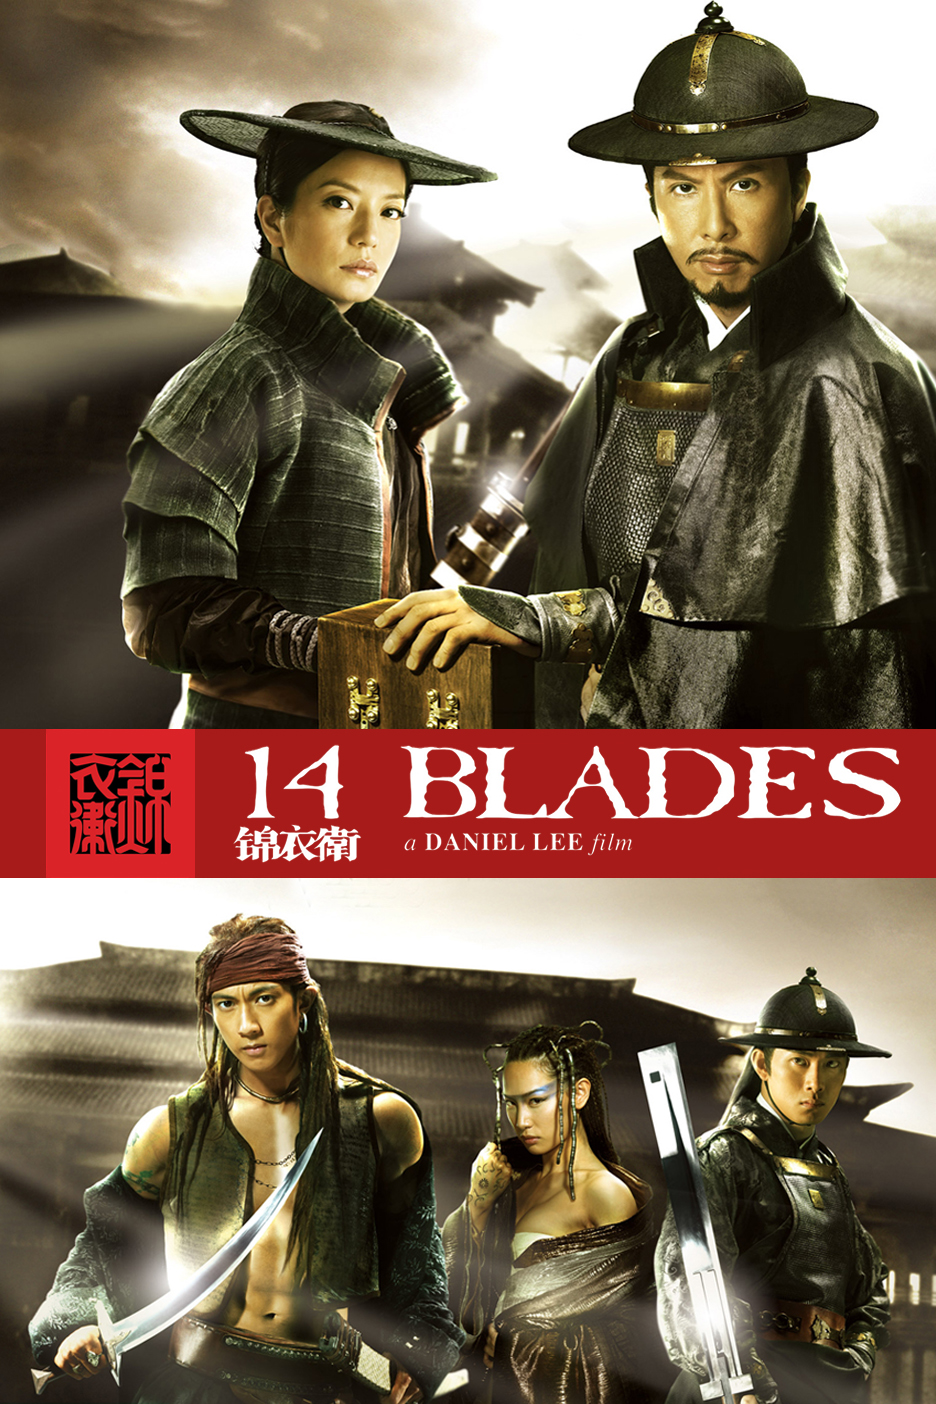 14 Blades - 14 Kılıç - 2010 - Türkçe Dublaj - BrRip.Xvid.avi [Tek Link]